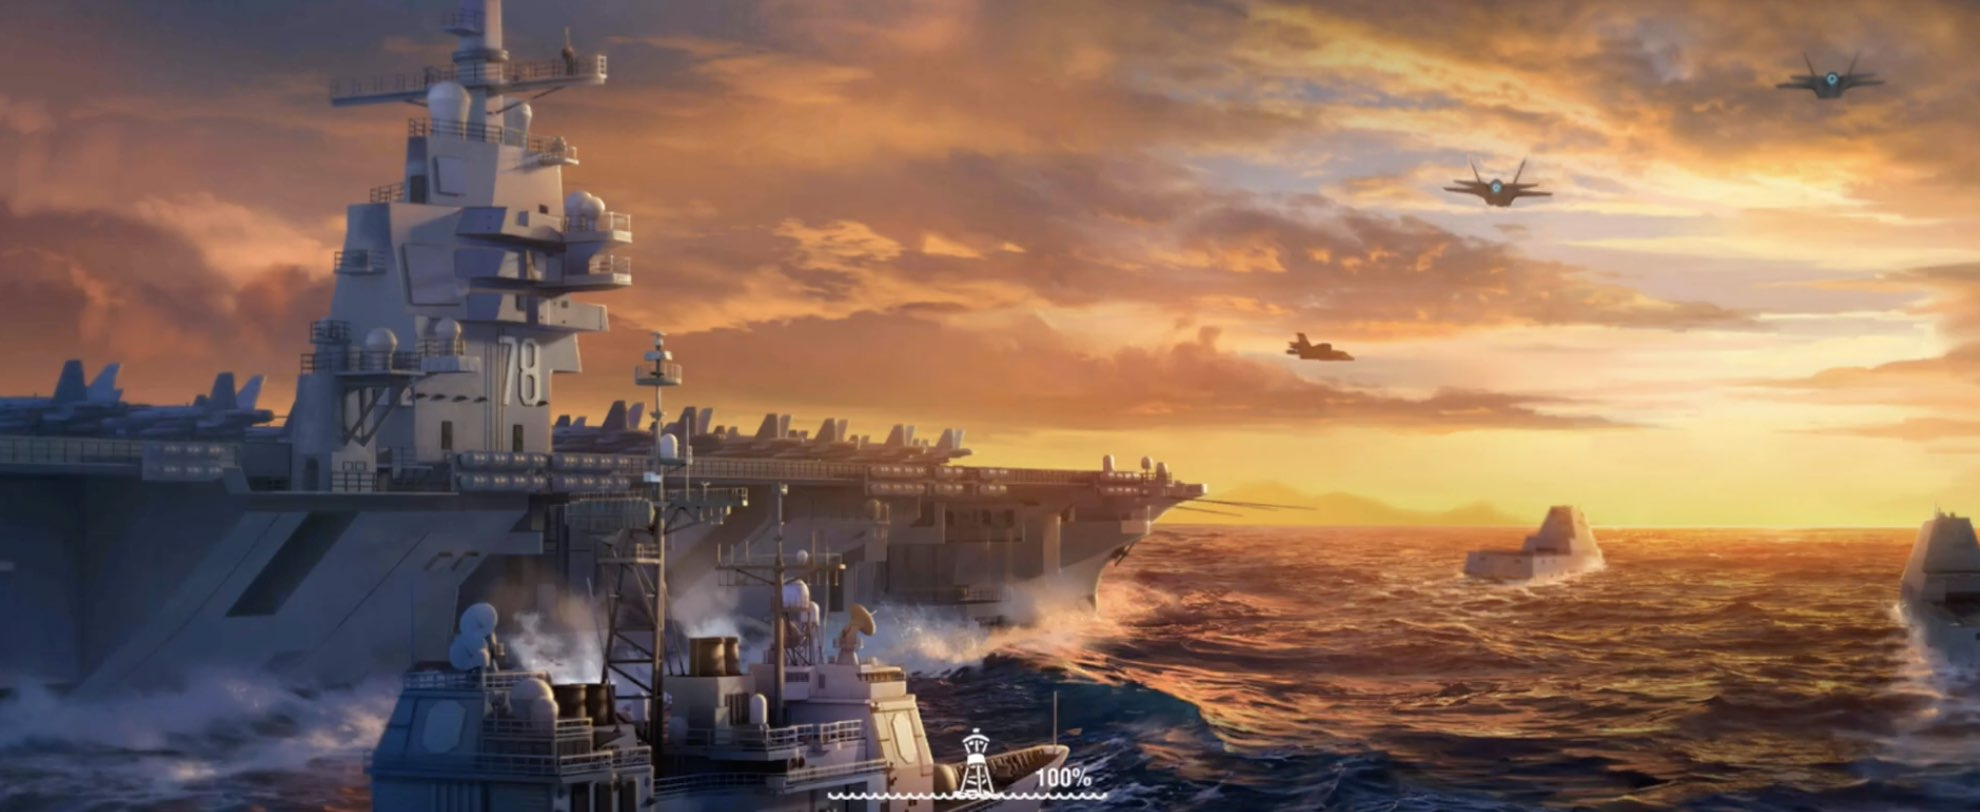 Warship Legend Idle tutorial